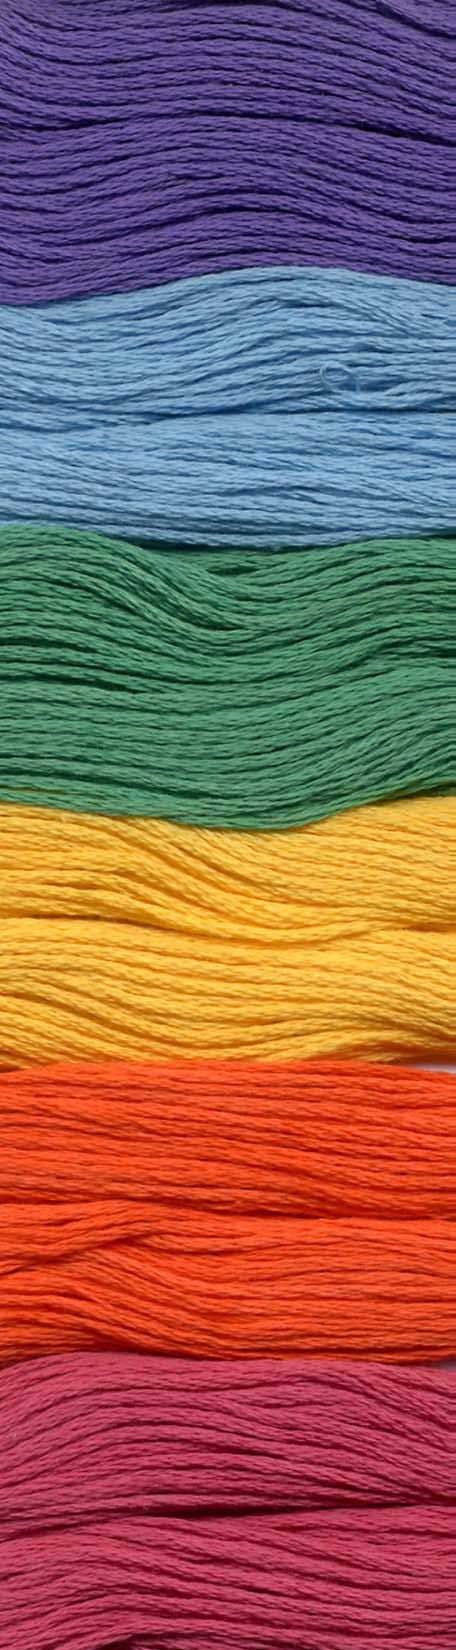 Pearl Cotton Size 8 Thread Sampler Pack Mardi Gras